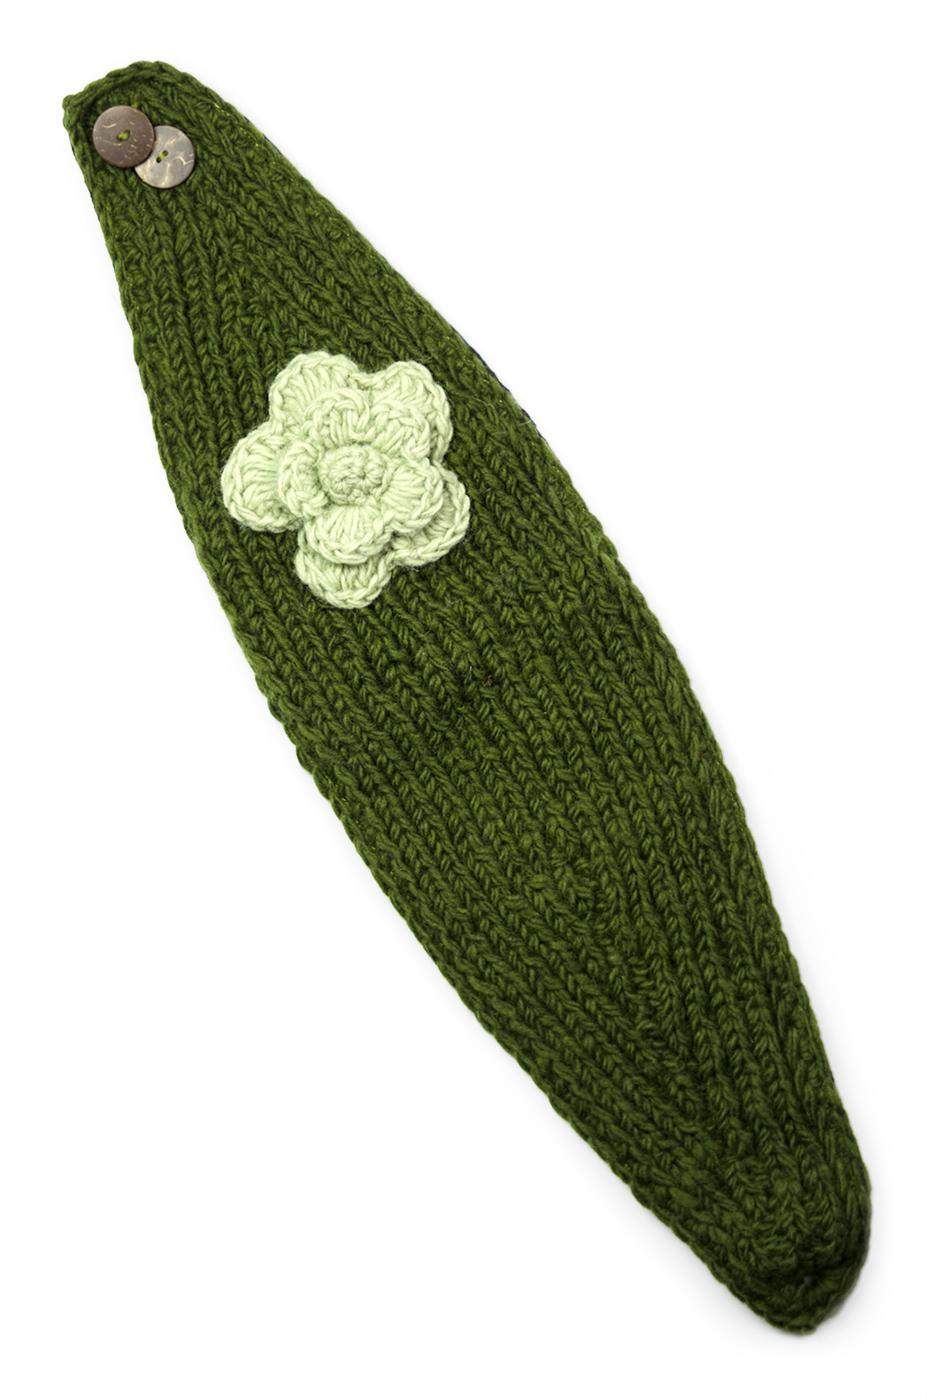 More Wool Flowery Headbands